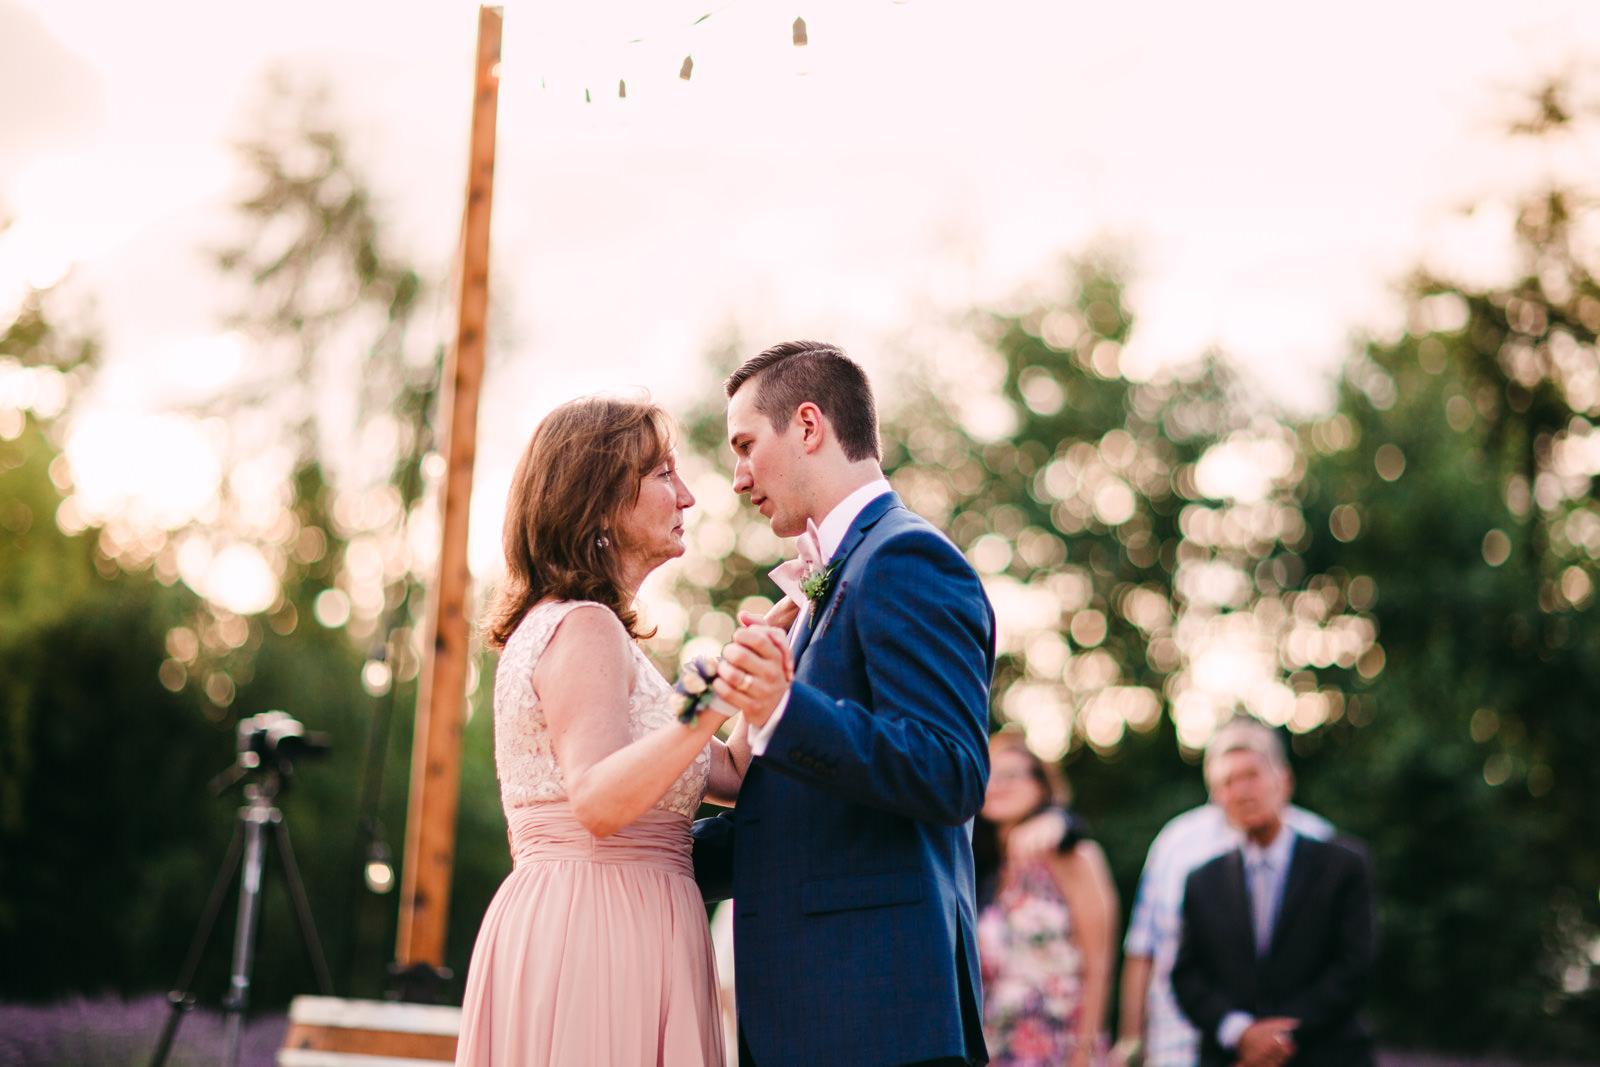 080-woodinville-lavendar-farm-wedding-with-golden-glowy-photos.jpg